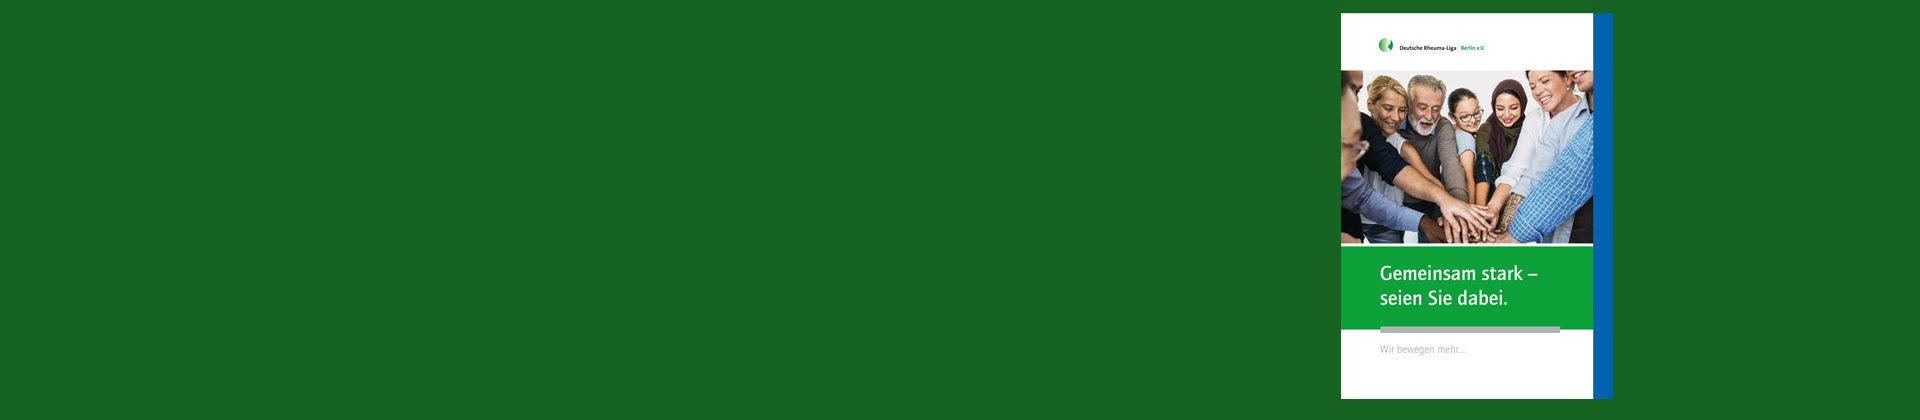 gemeinsam-stark-broschur-rheuma-liga-berlin-Banner-RLB